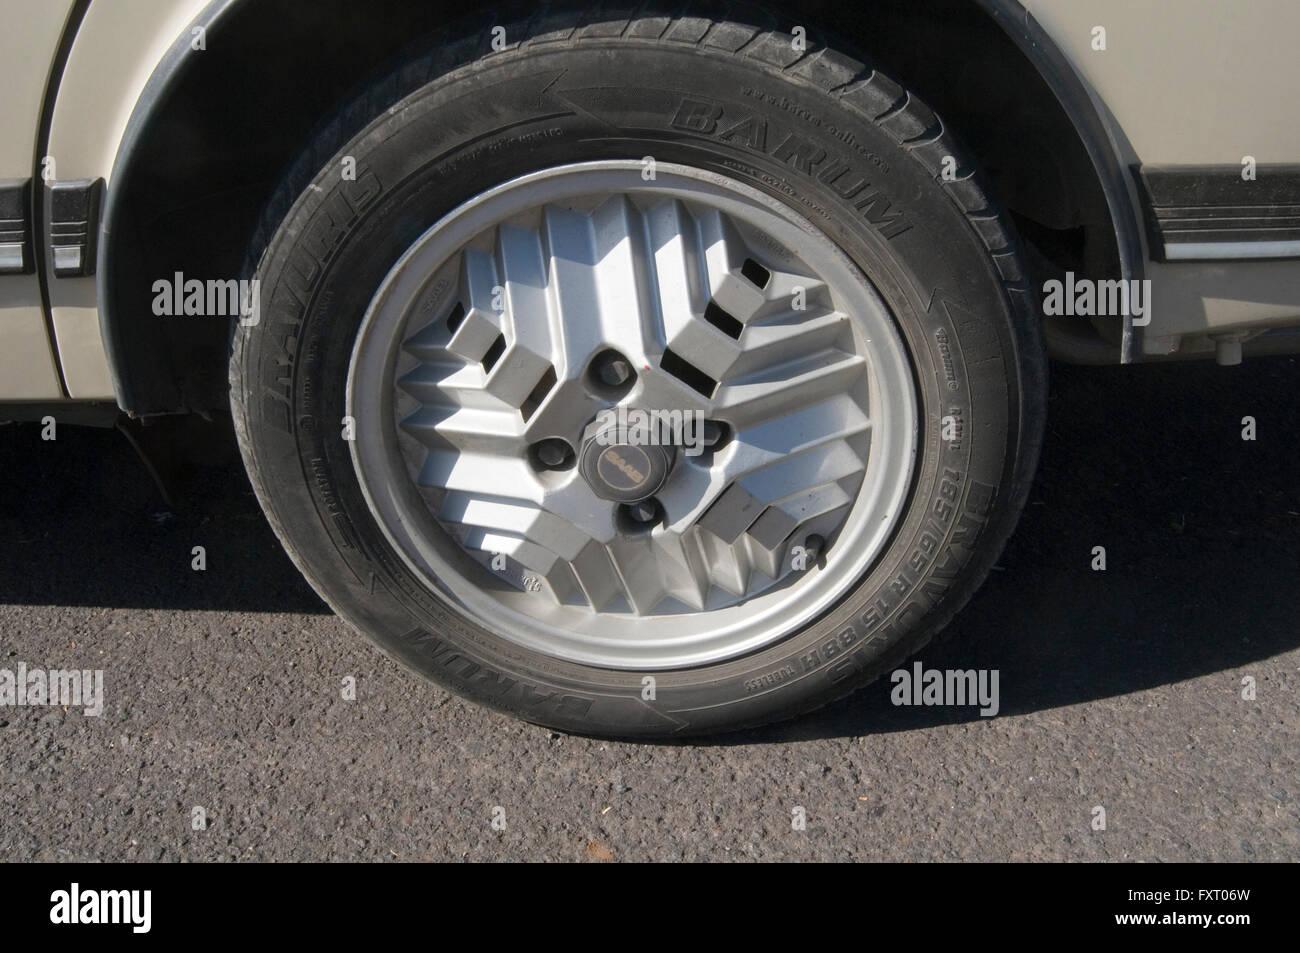 Saab 900 turbo car cars strange unusual wheels wheel deign called Aztec aztecs - Stock Image